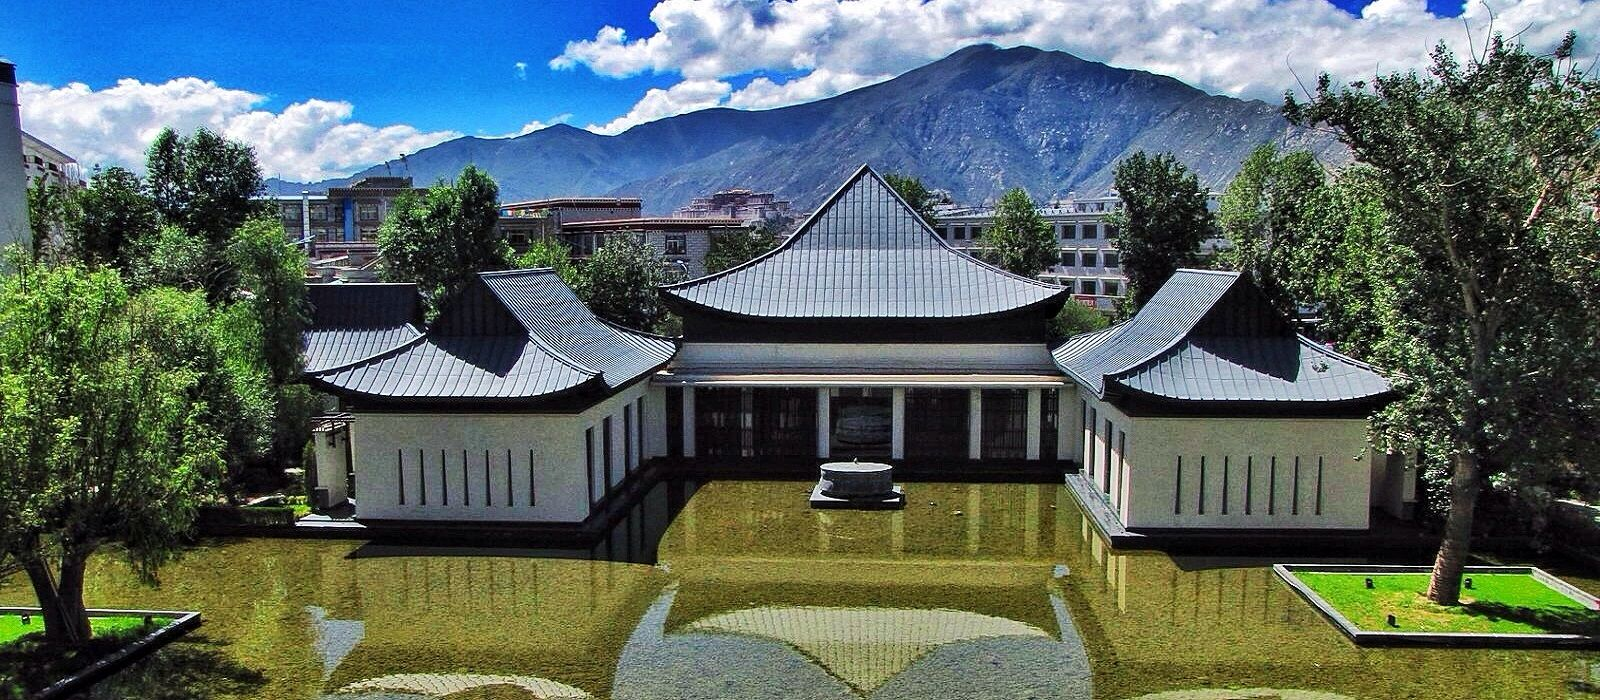 Hotel St. Regis, Lhasa Tibet